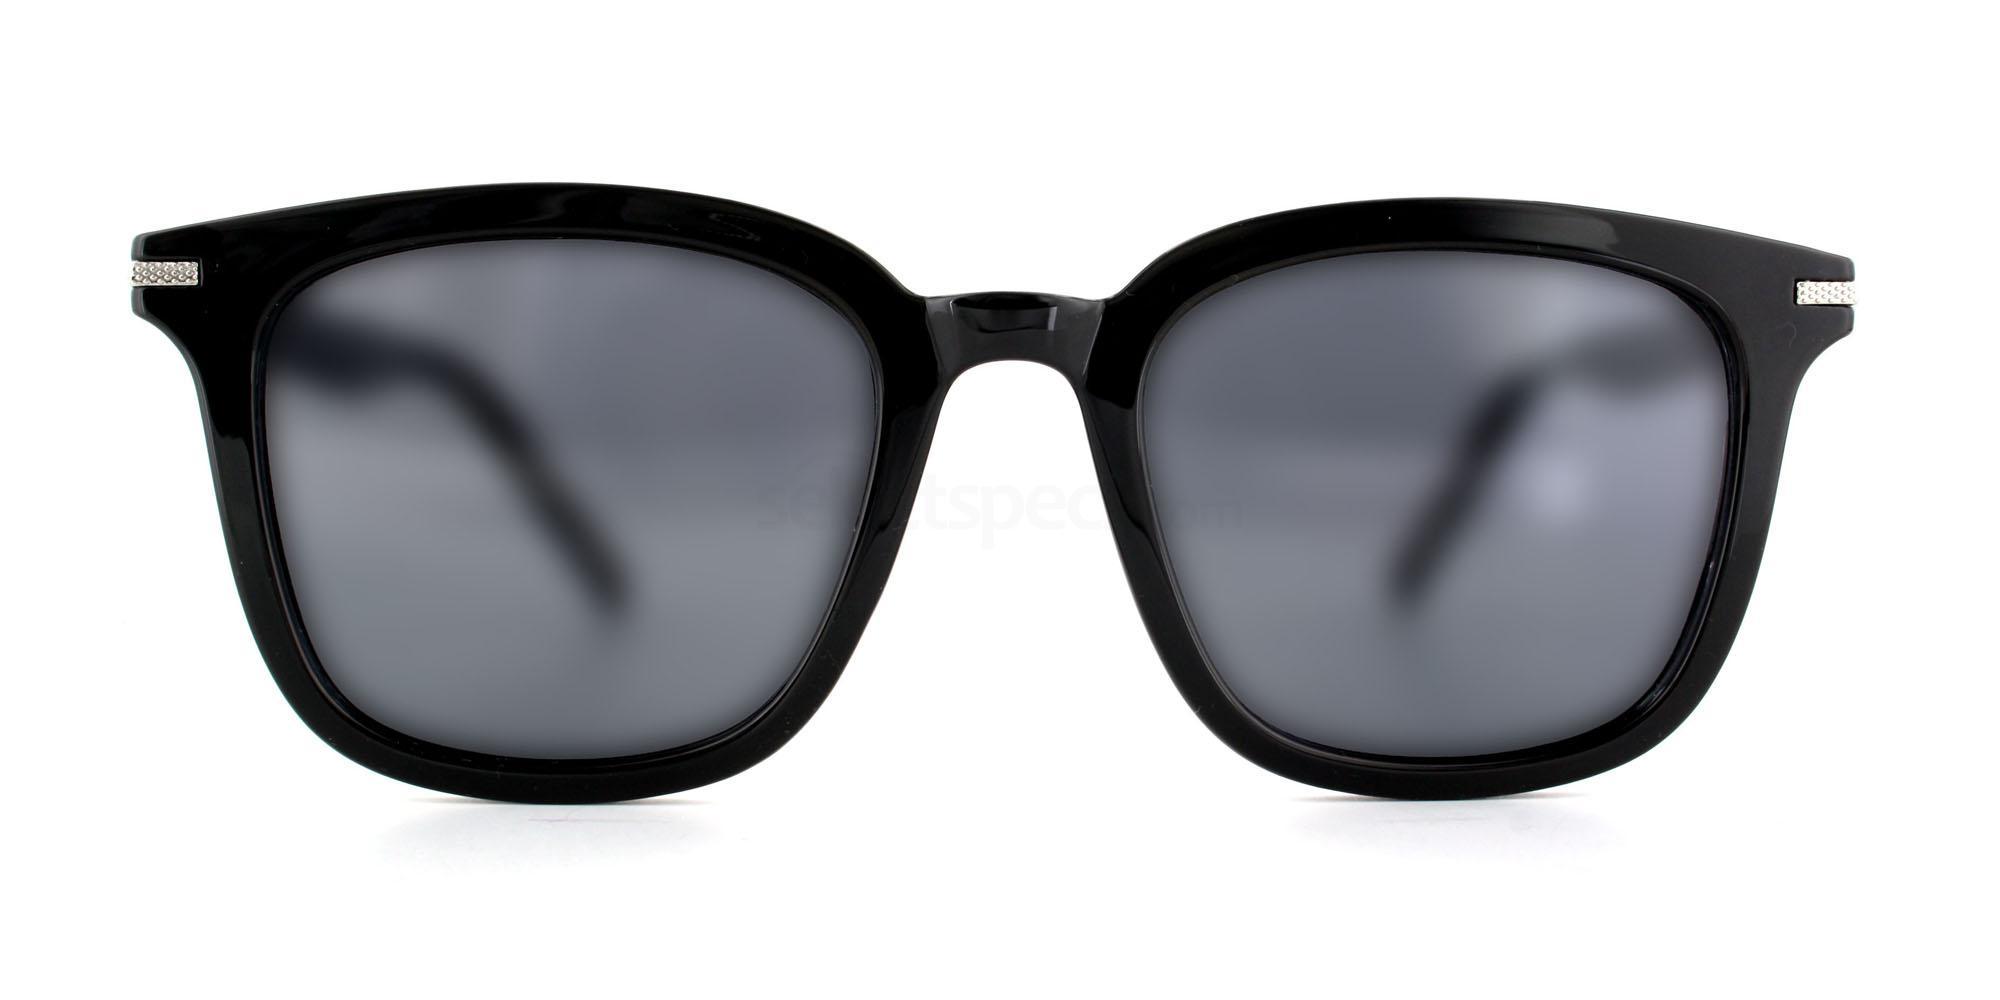 C1 S1042 Sunglasses, SelectSpecs